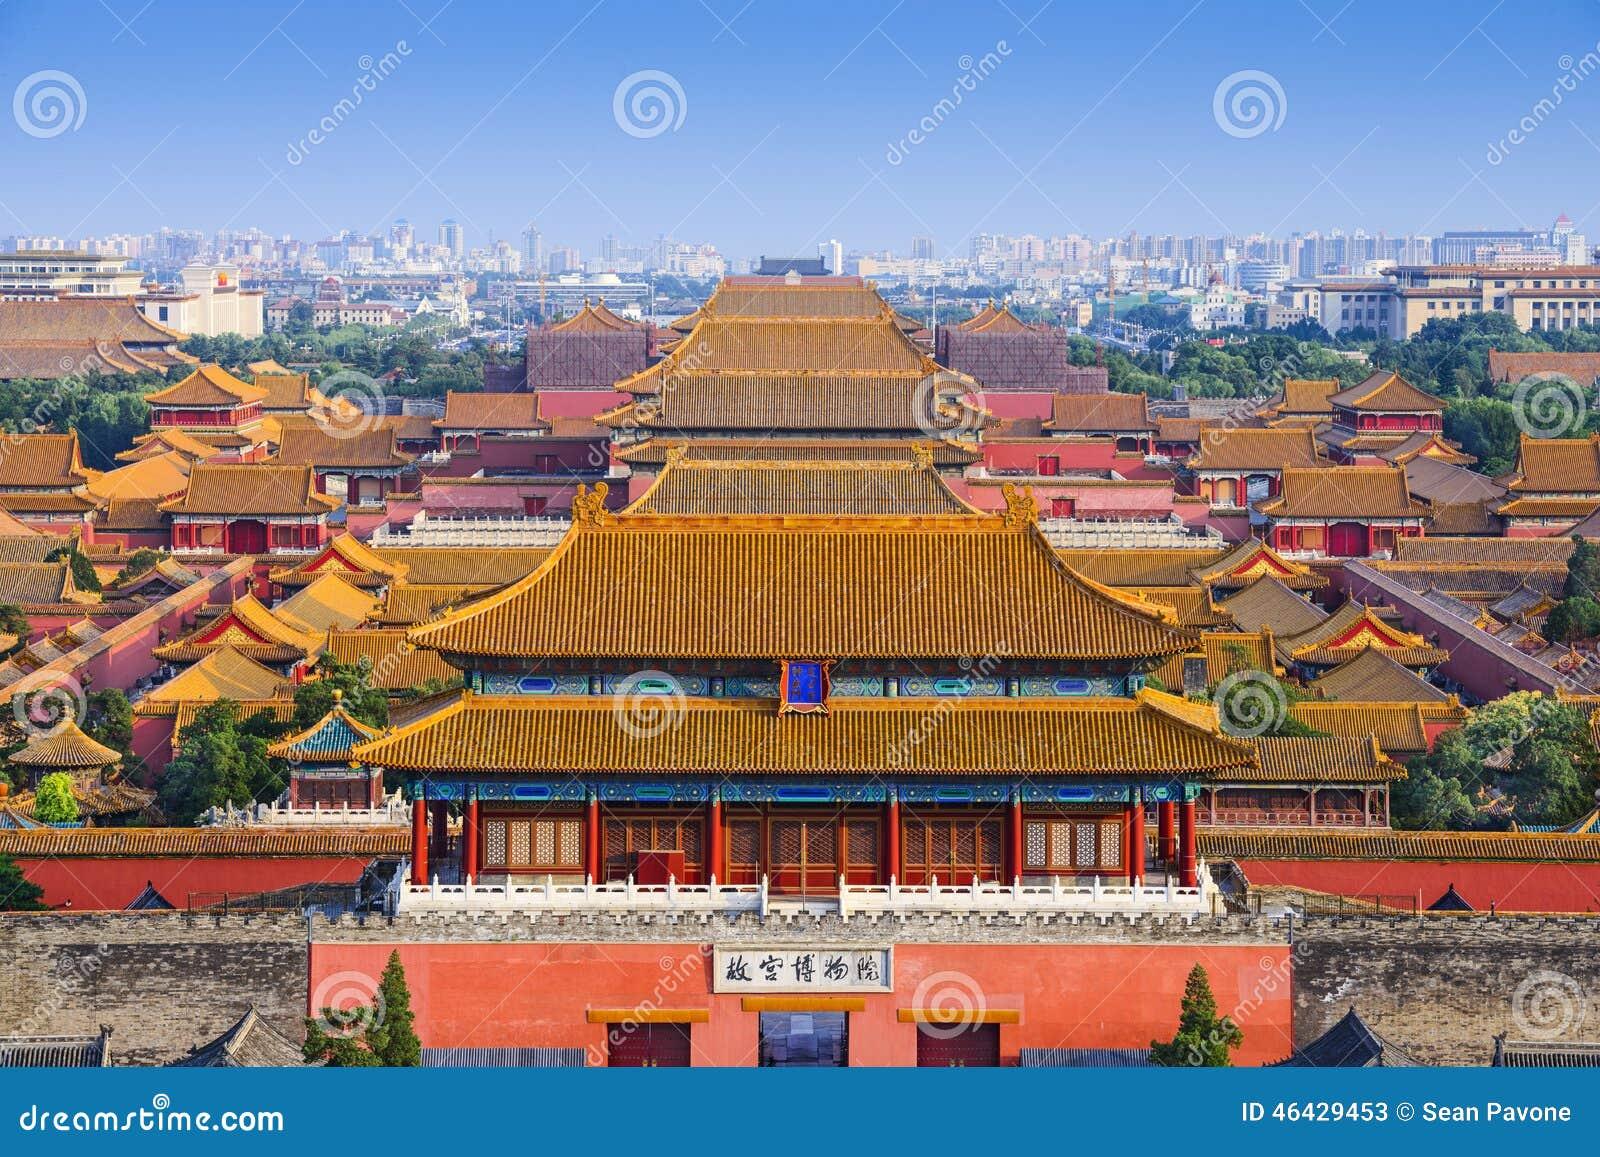 Download Beijing China Forbidden City Stock Image